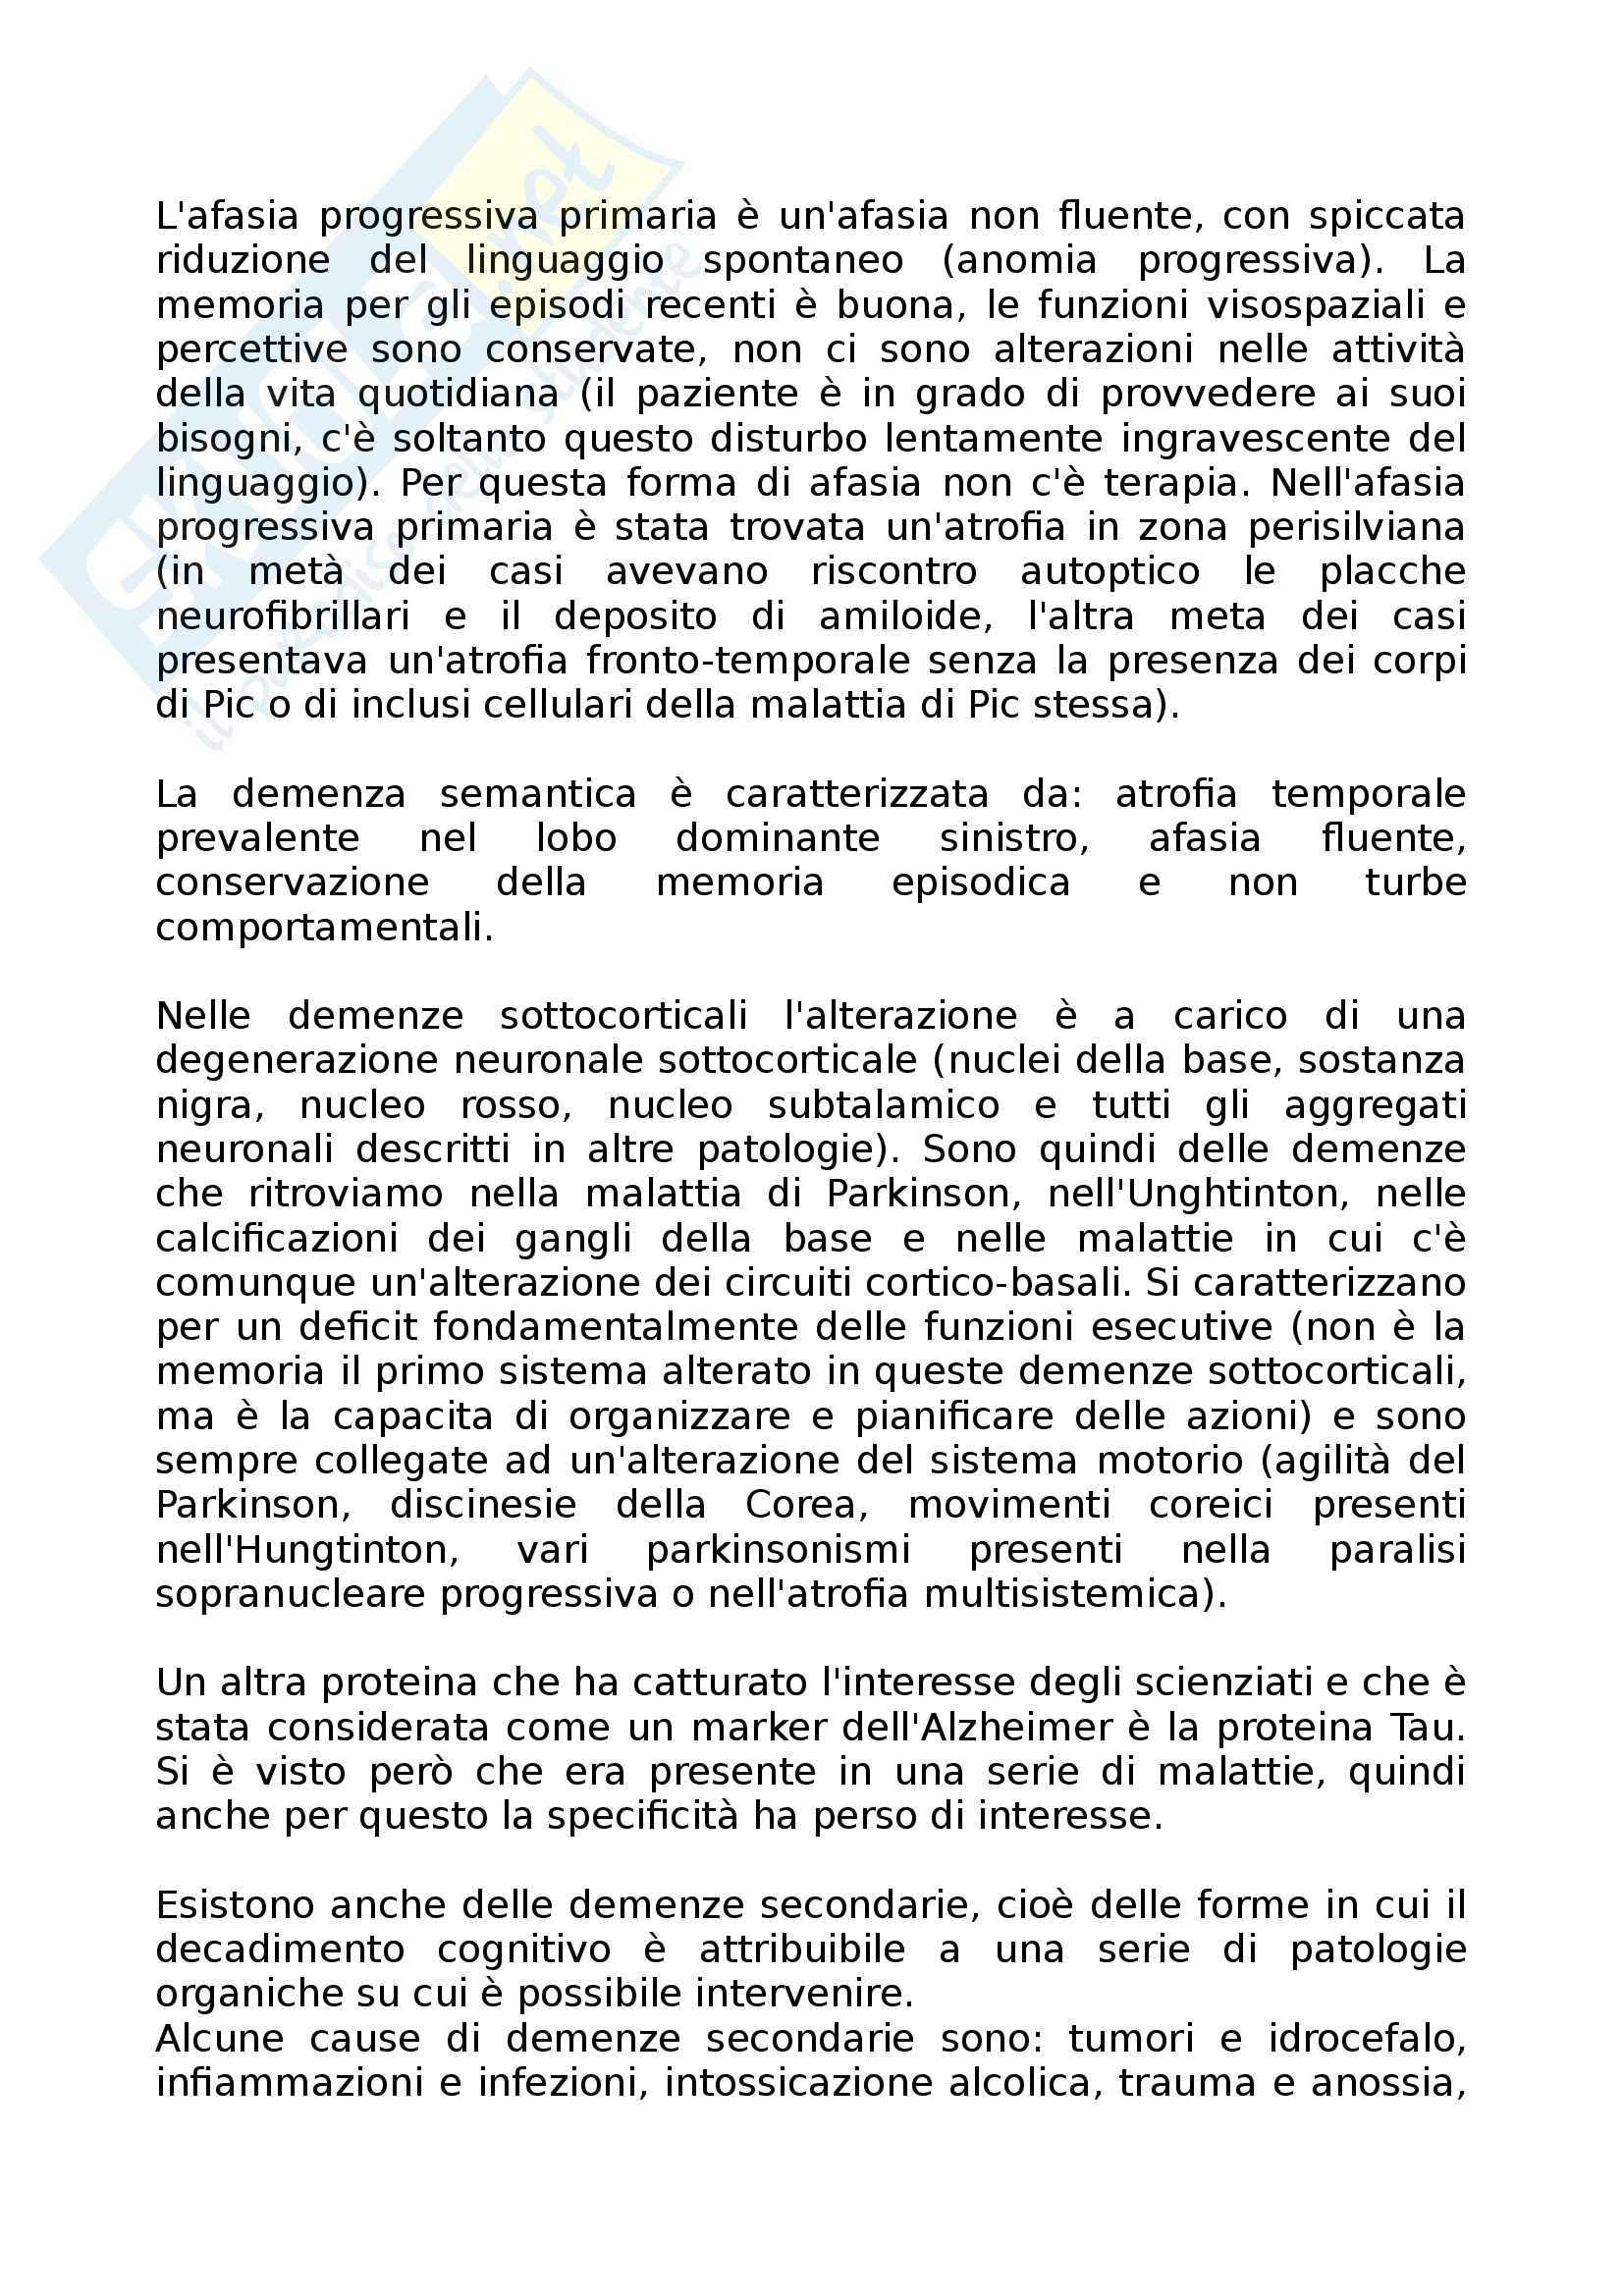 Neurologia - Appunti Pag. 111